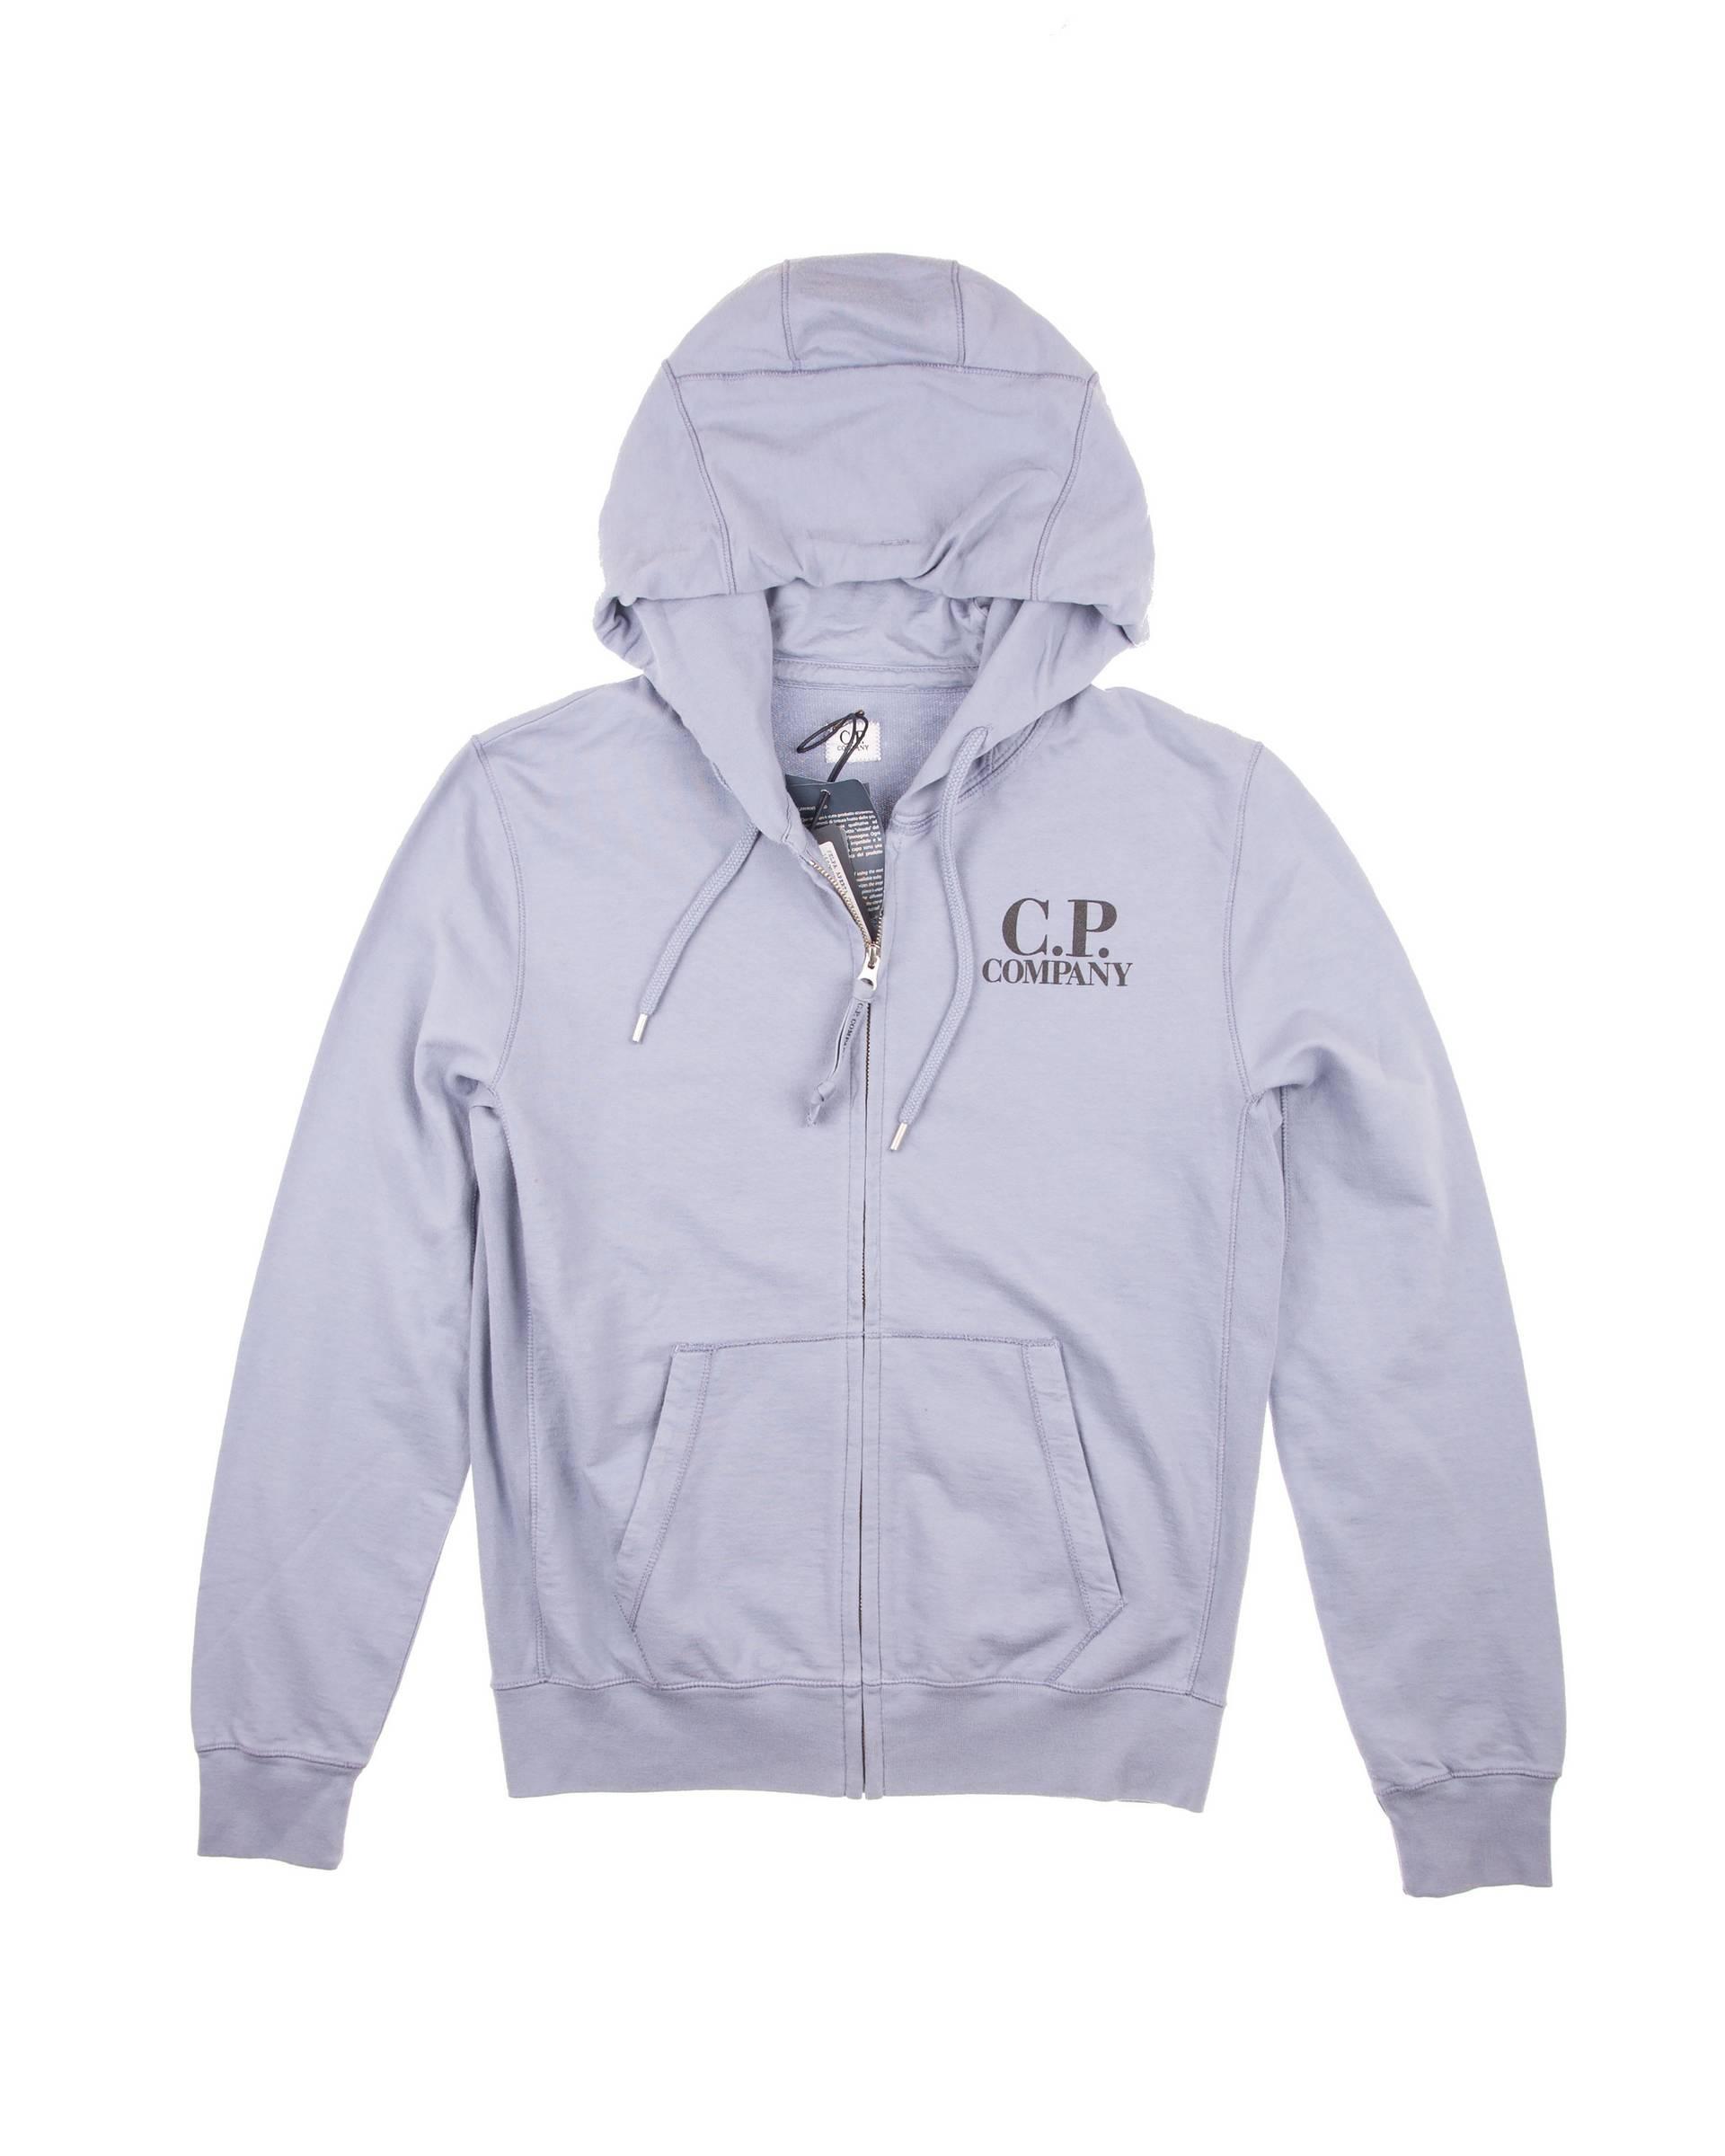 Толстовка C.P.Company Grey/Blue Zip Hoodie